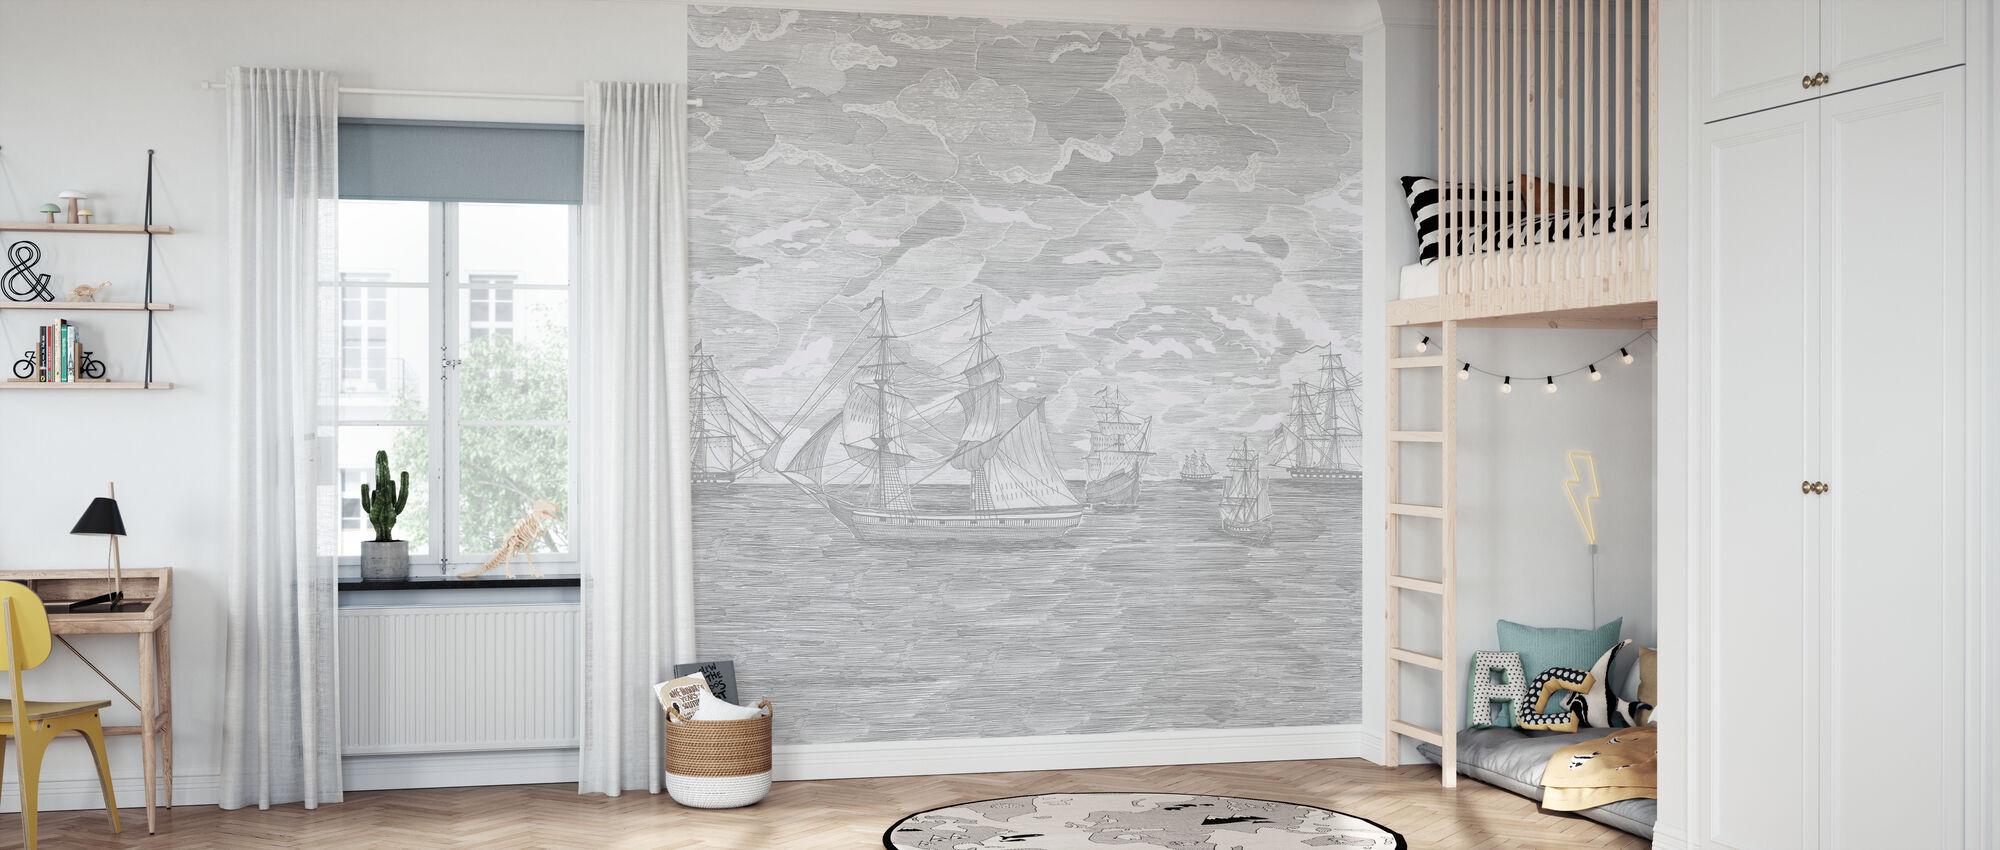 Sail Away - Grey - Wallpaper - Kids Room